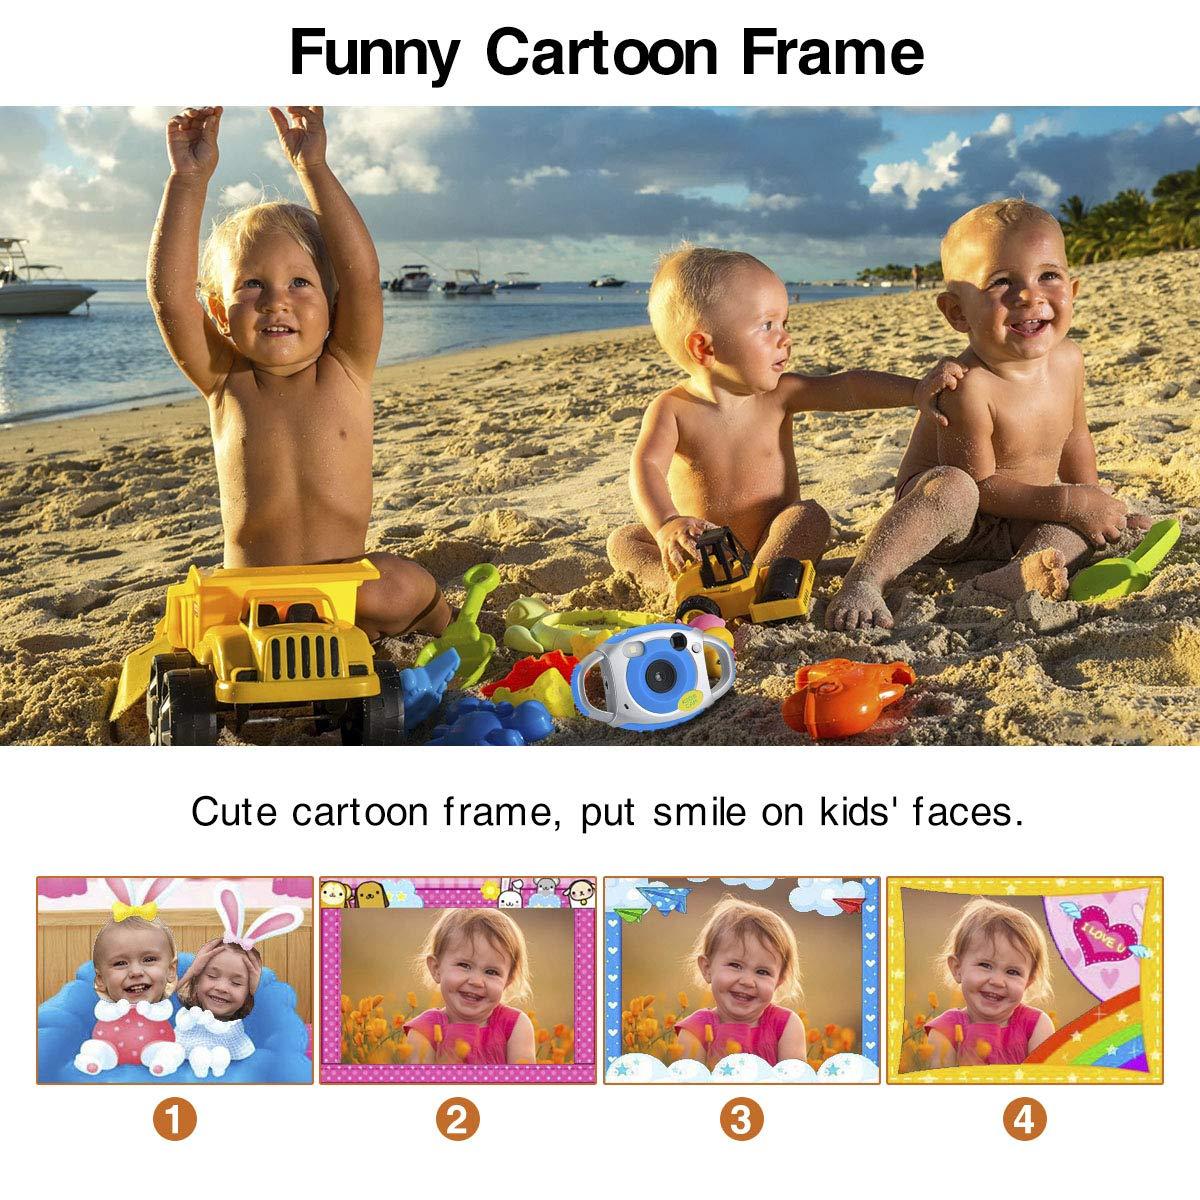 Funkprofi Kids Camera, Kids Digital Video Camera 5MP 1080P HD Recorder Camcorder with 32GB TF Memory Card, 1.77 Inch Screen, Funny Photo Frame, for Kids by Funkprofi (Image #4)